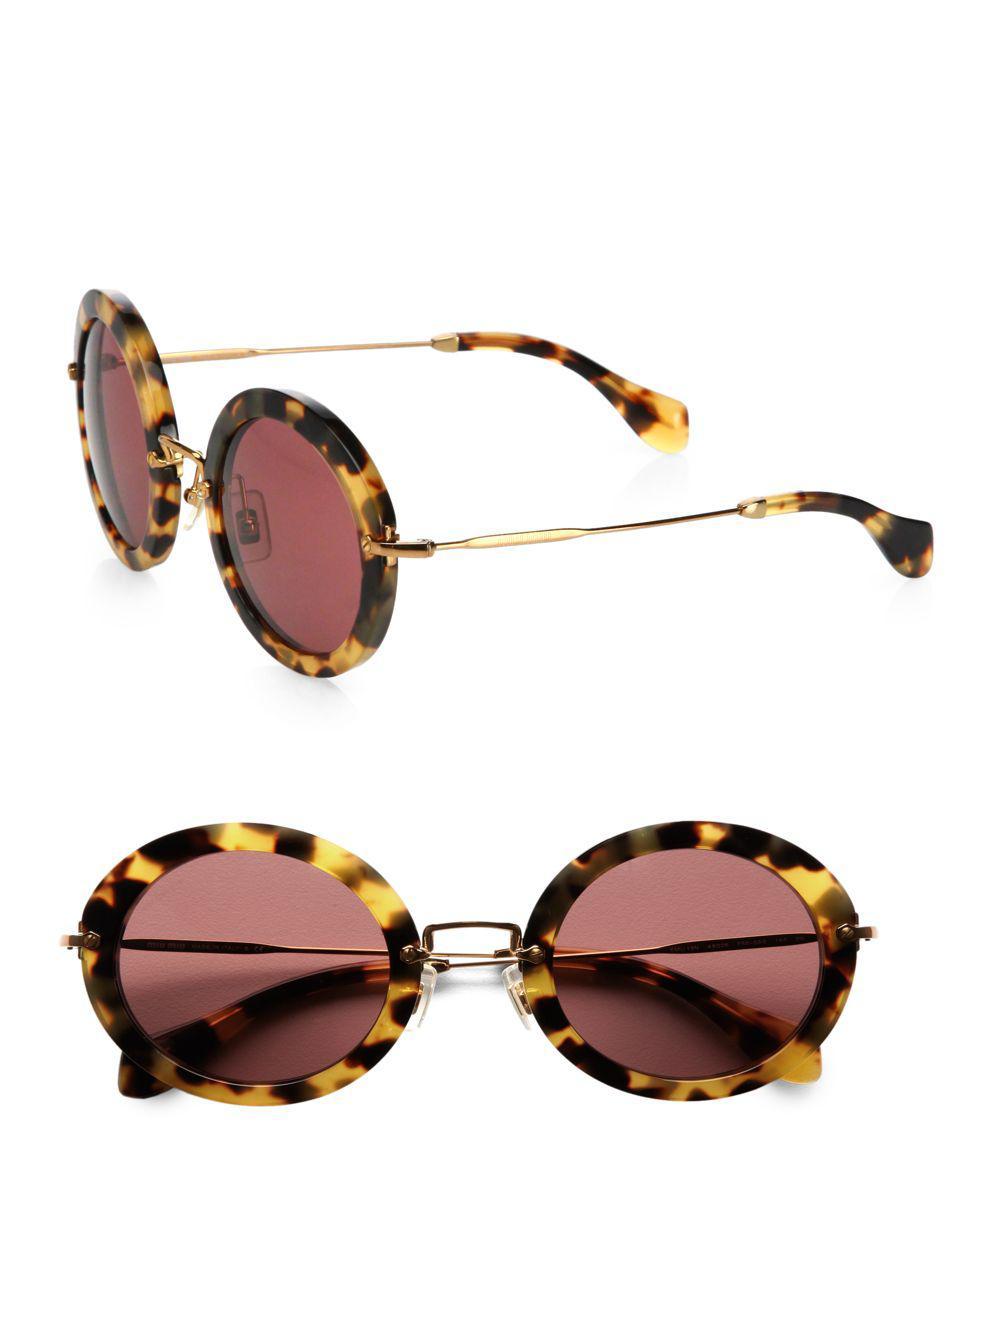 af485f3abf47 Miu Miu. Women s Retro Noir Round Acetate Sunglasses